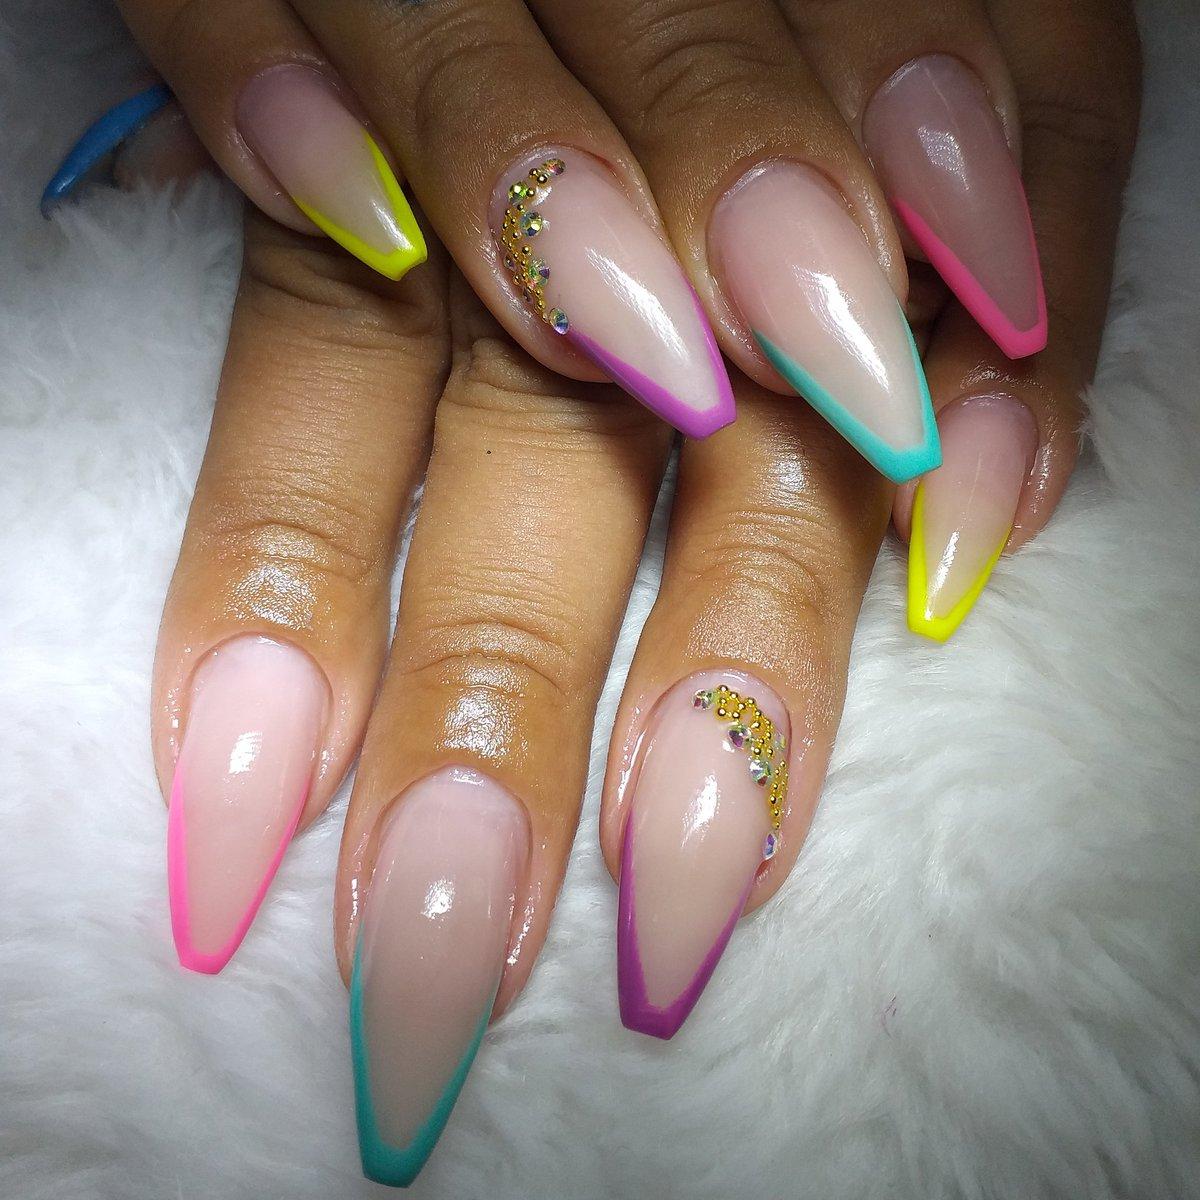 E essa nova tendência??? Tô apaixonadaaaaa   #nailsdesign  #nailstyle #encapsuladas #encapsuladasnailspic.twitter.com/bh22U5yIuk